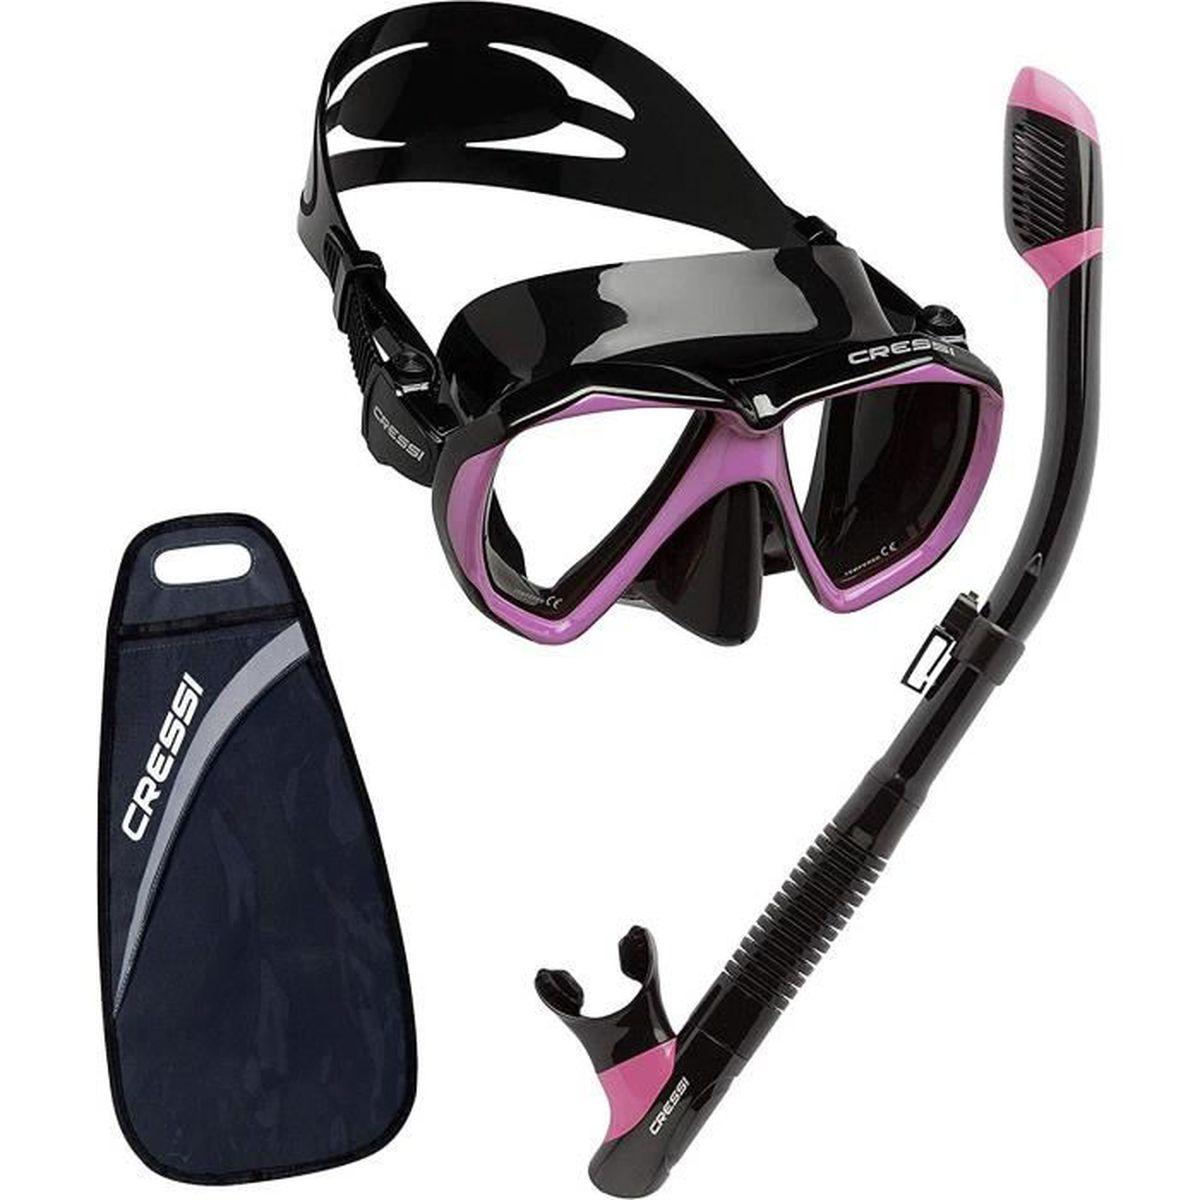 Premium Masque Plong/ée et Snorkeling Cressi Marea Adulte